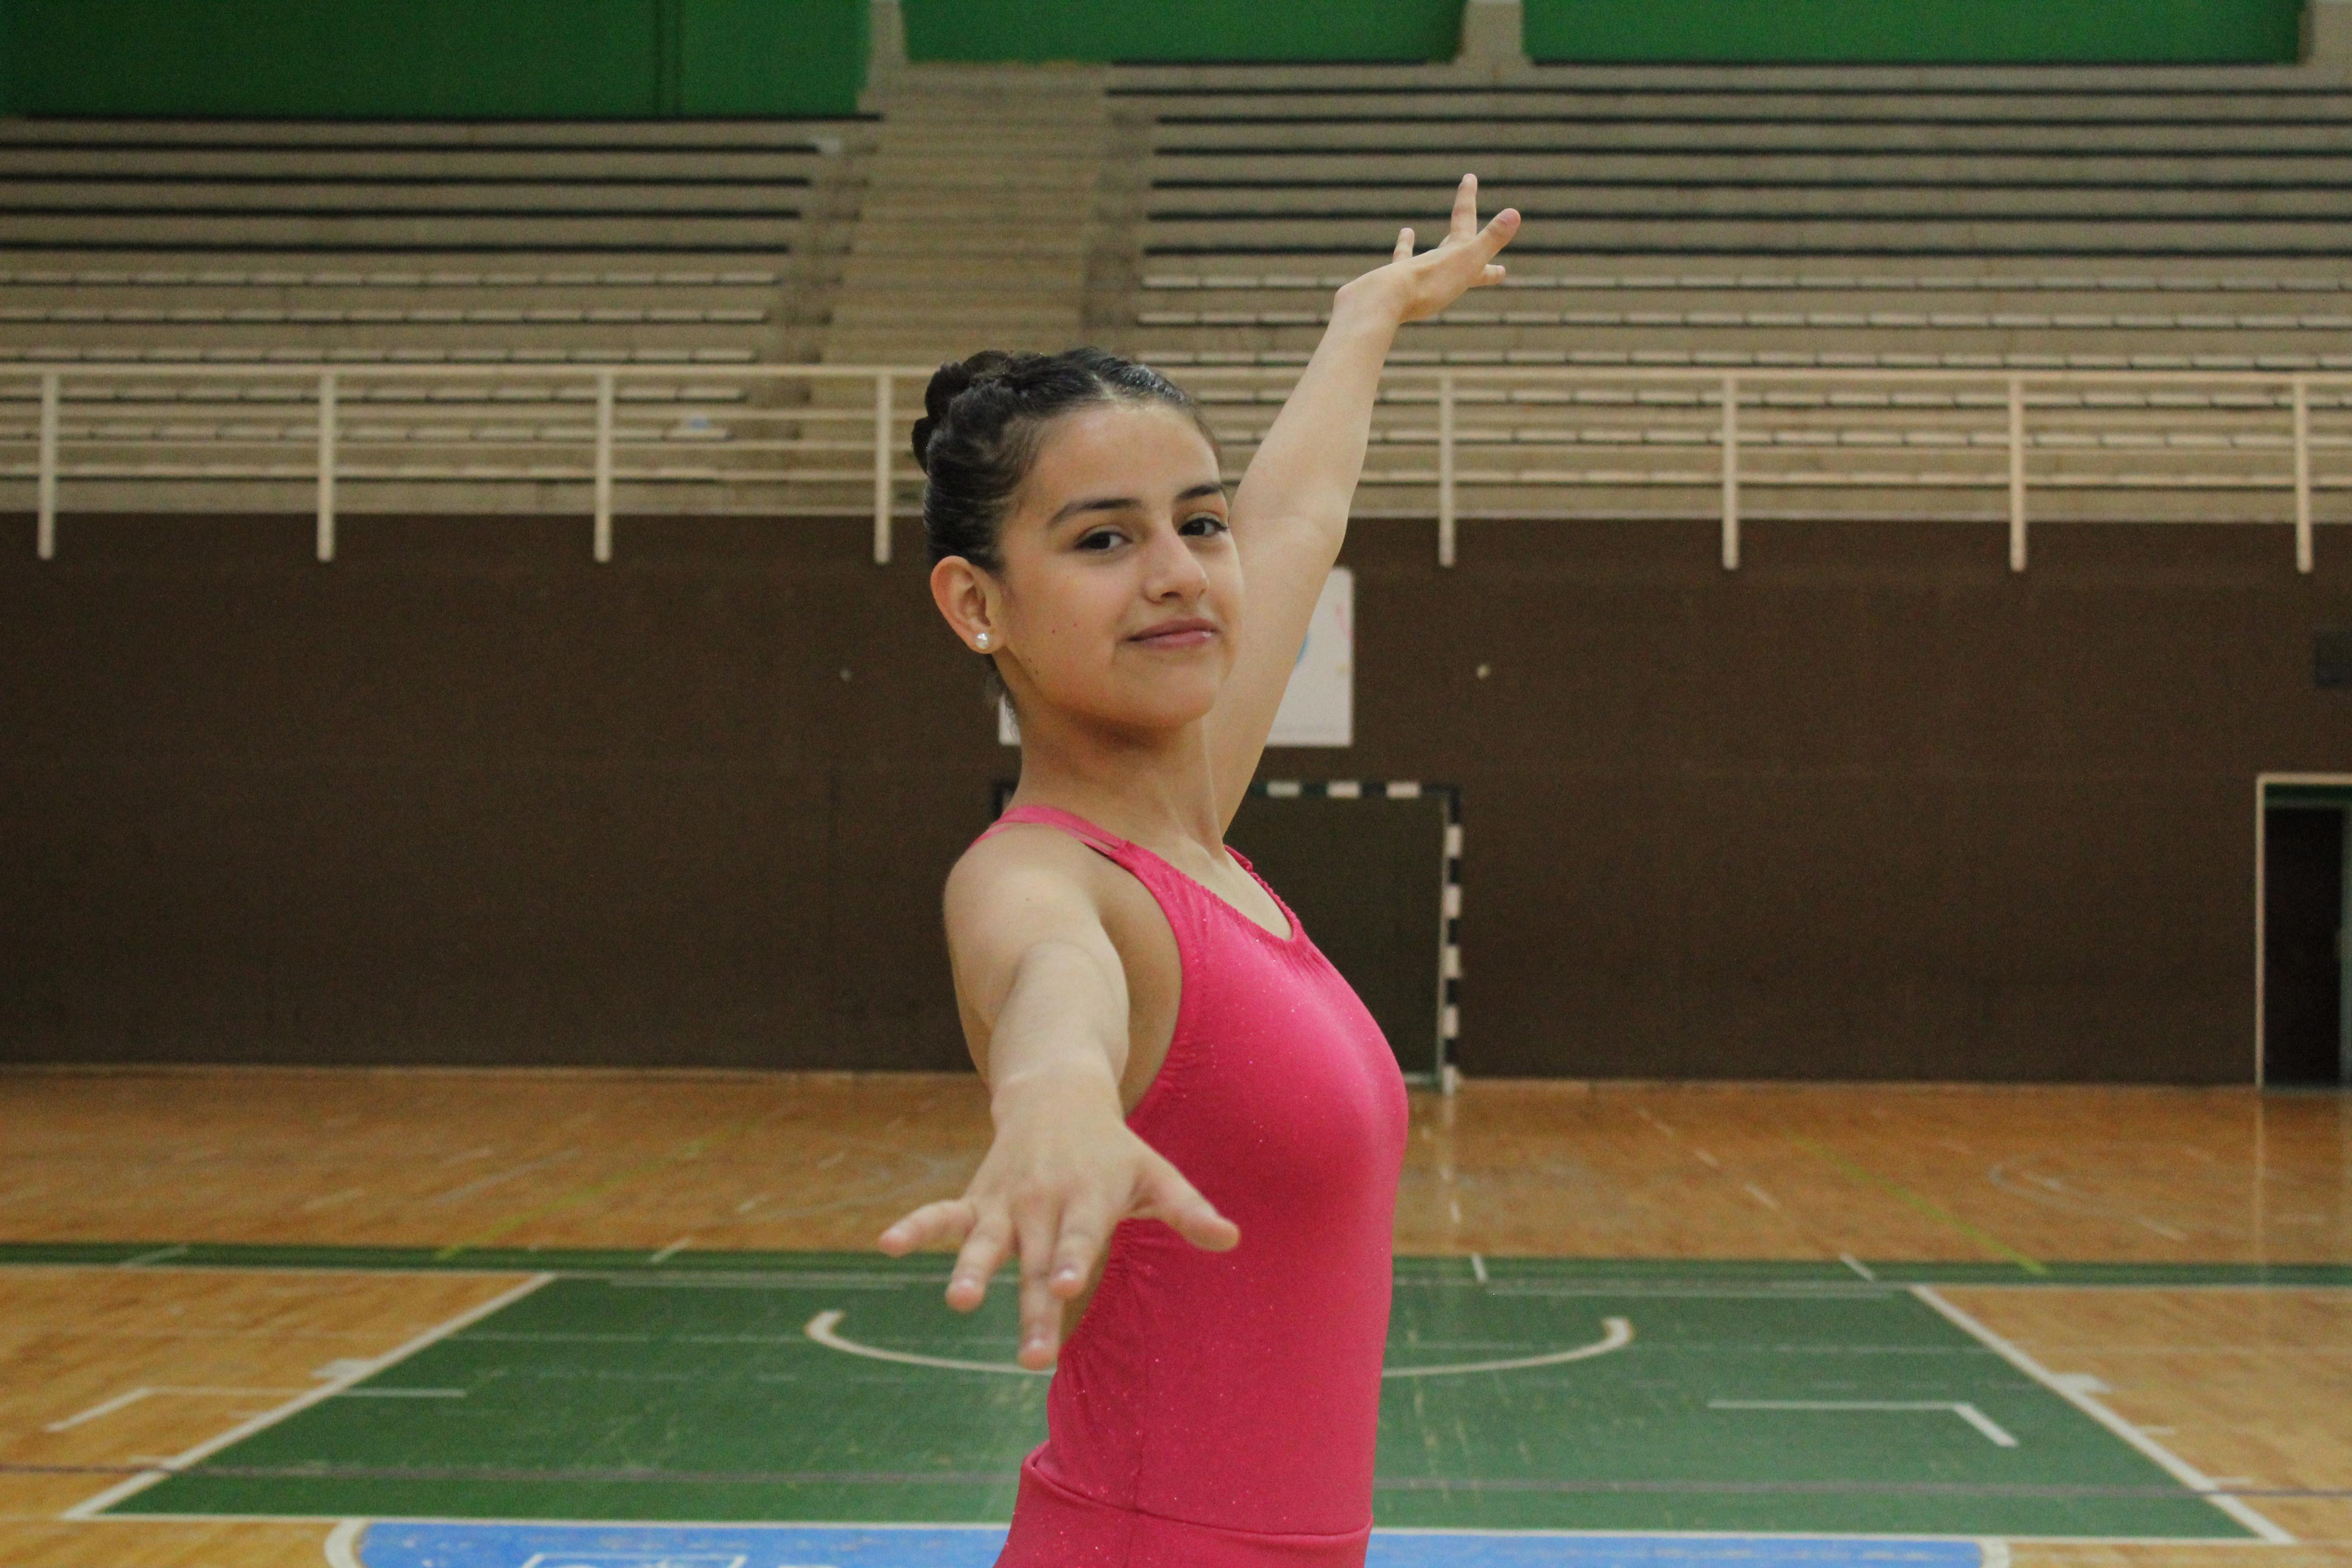 Abril Ortega, patinadora de Energy Skate categoría Cadete. FOTO: MATIAS BARRIENTOS